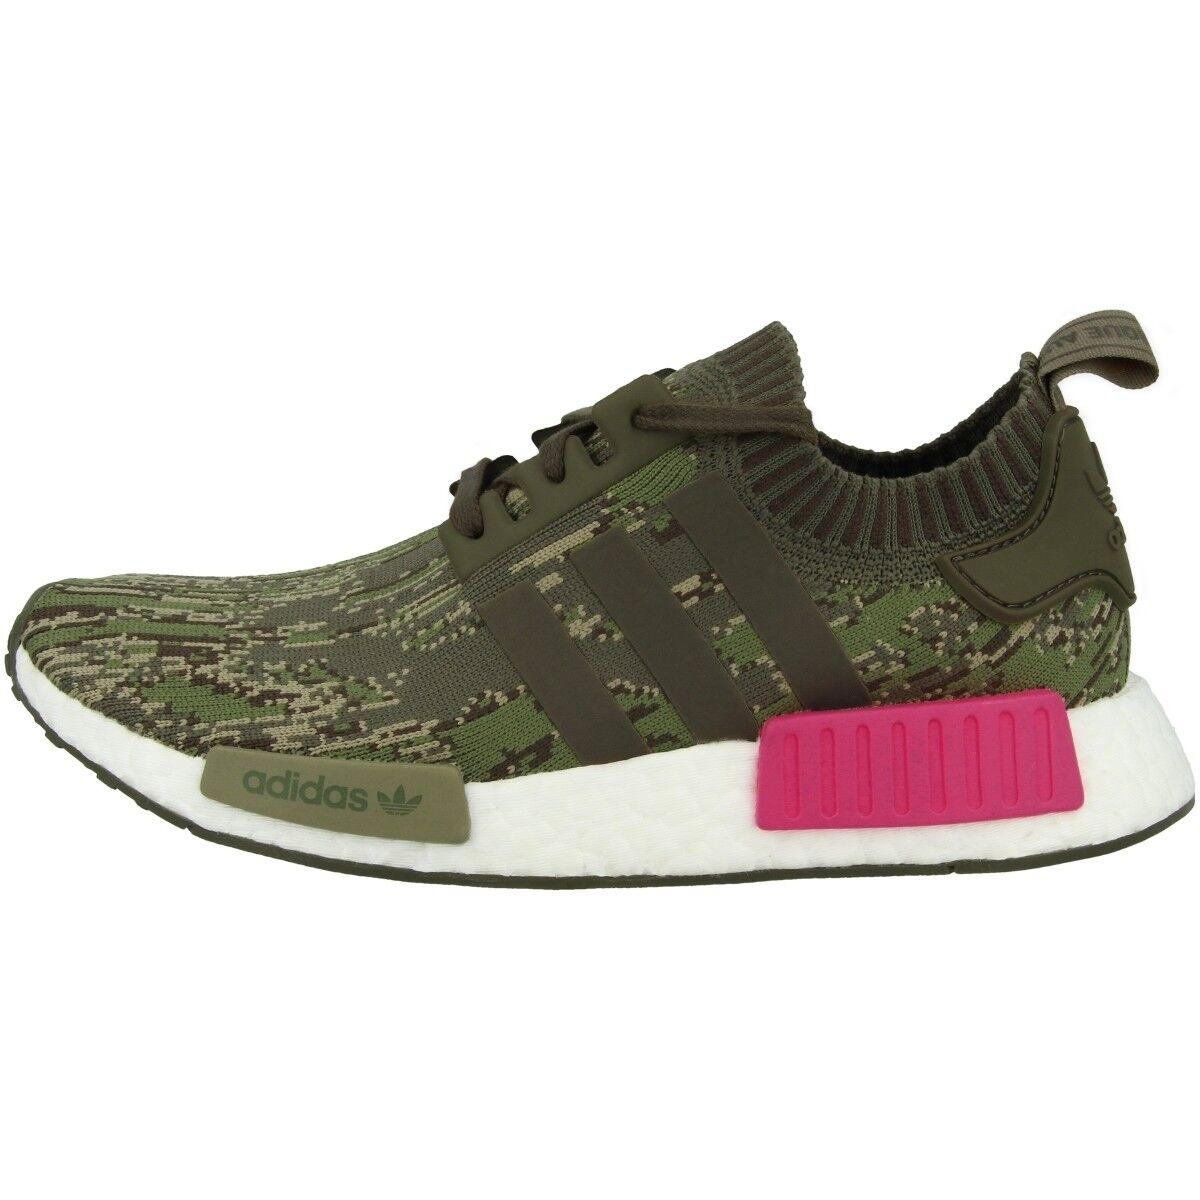 Adidas nmd_r1 Primeknit Chaussures Hommes Loisirs Basket Vert Utility Gris bz0222